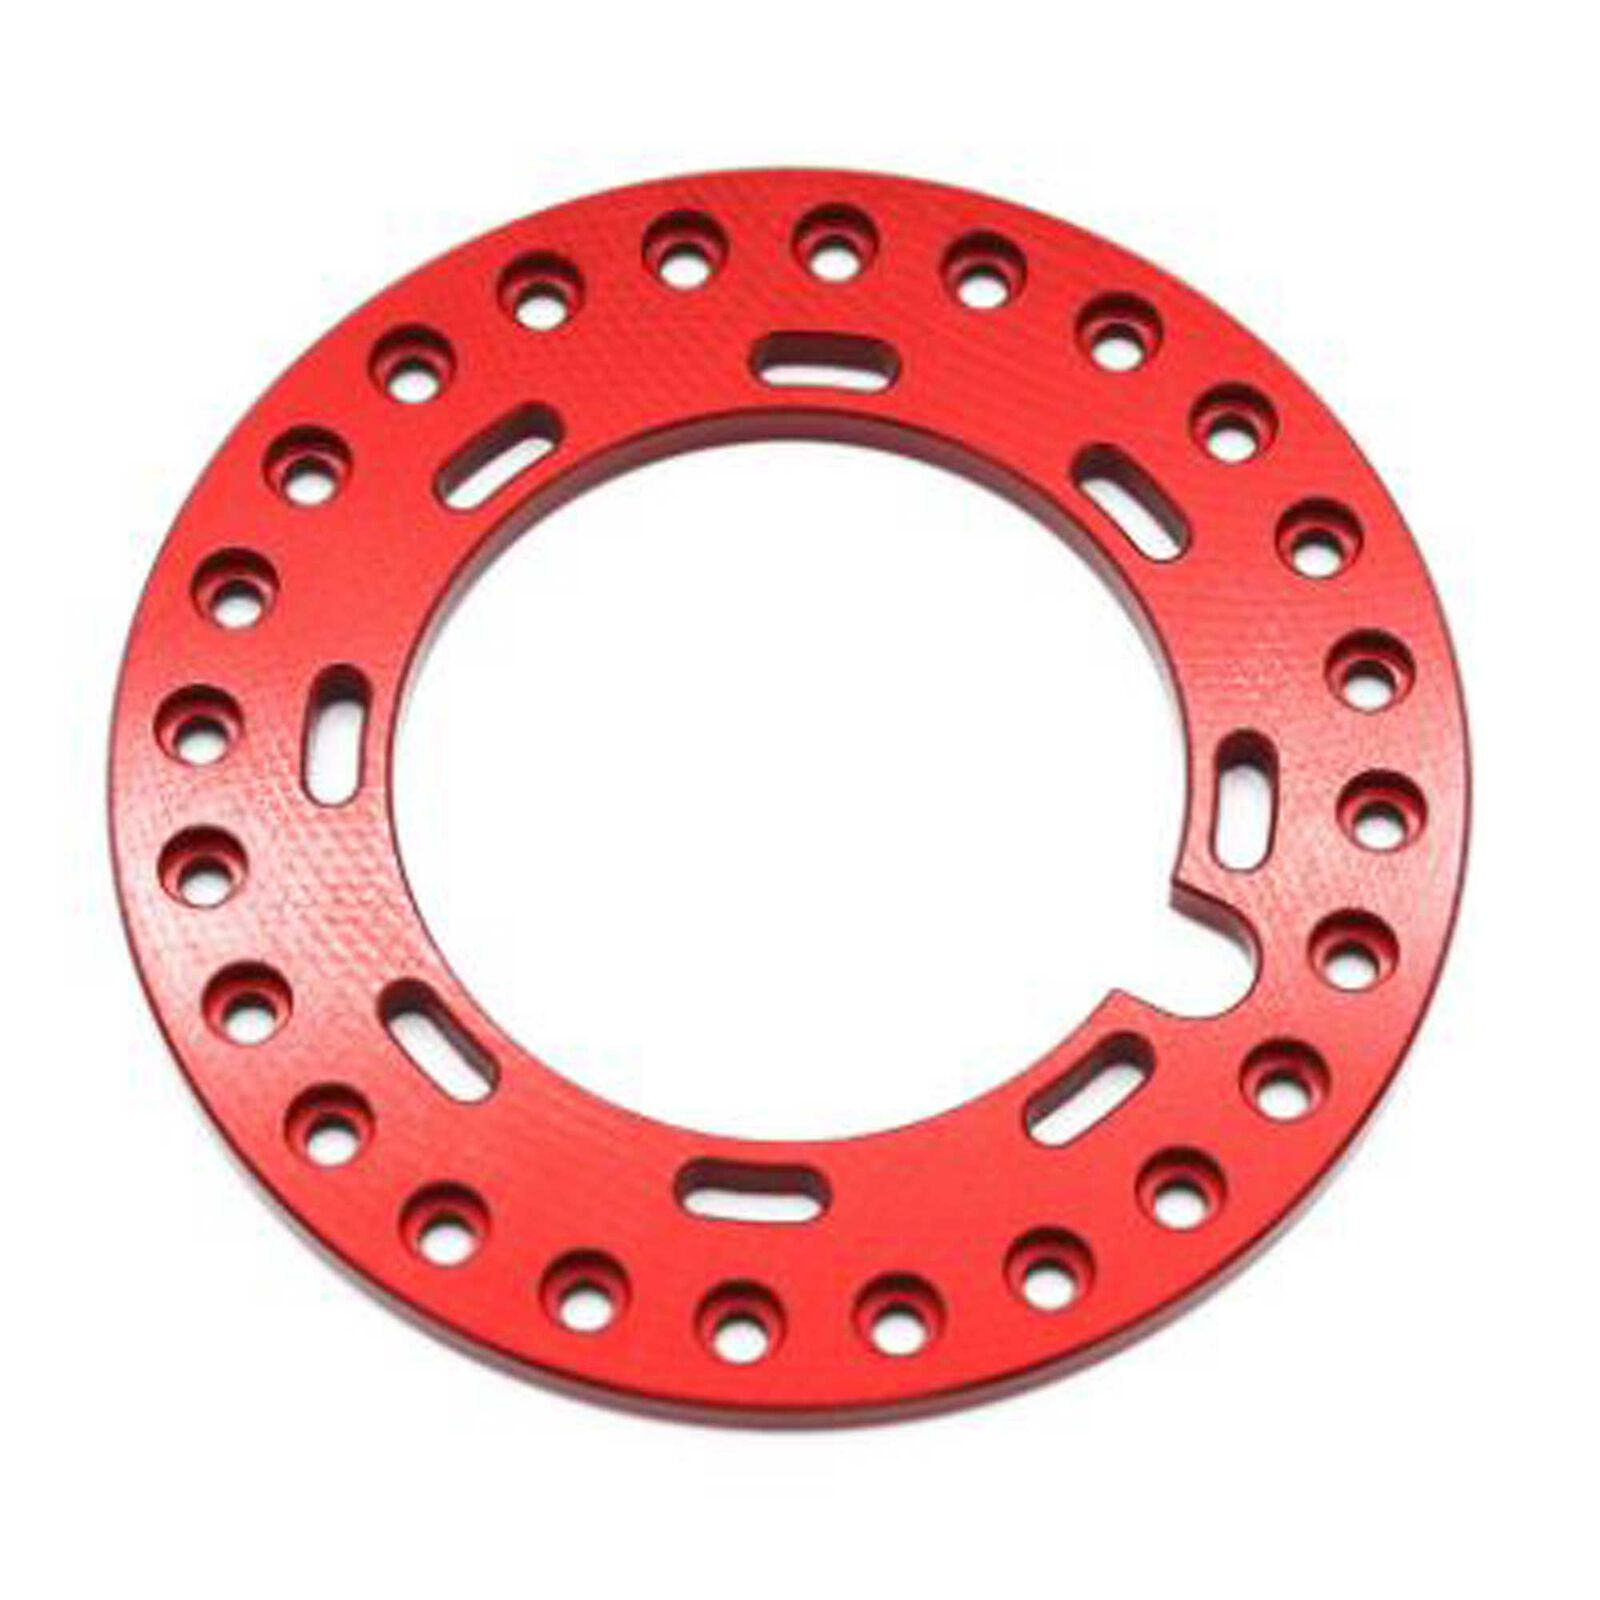 1.9 IBTR Beadlock Red Anodized